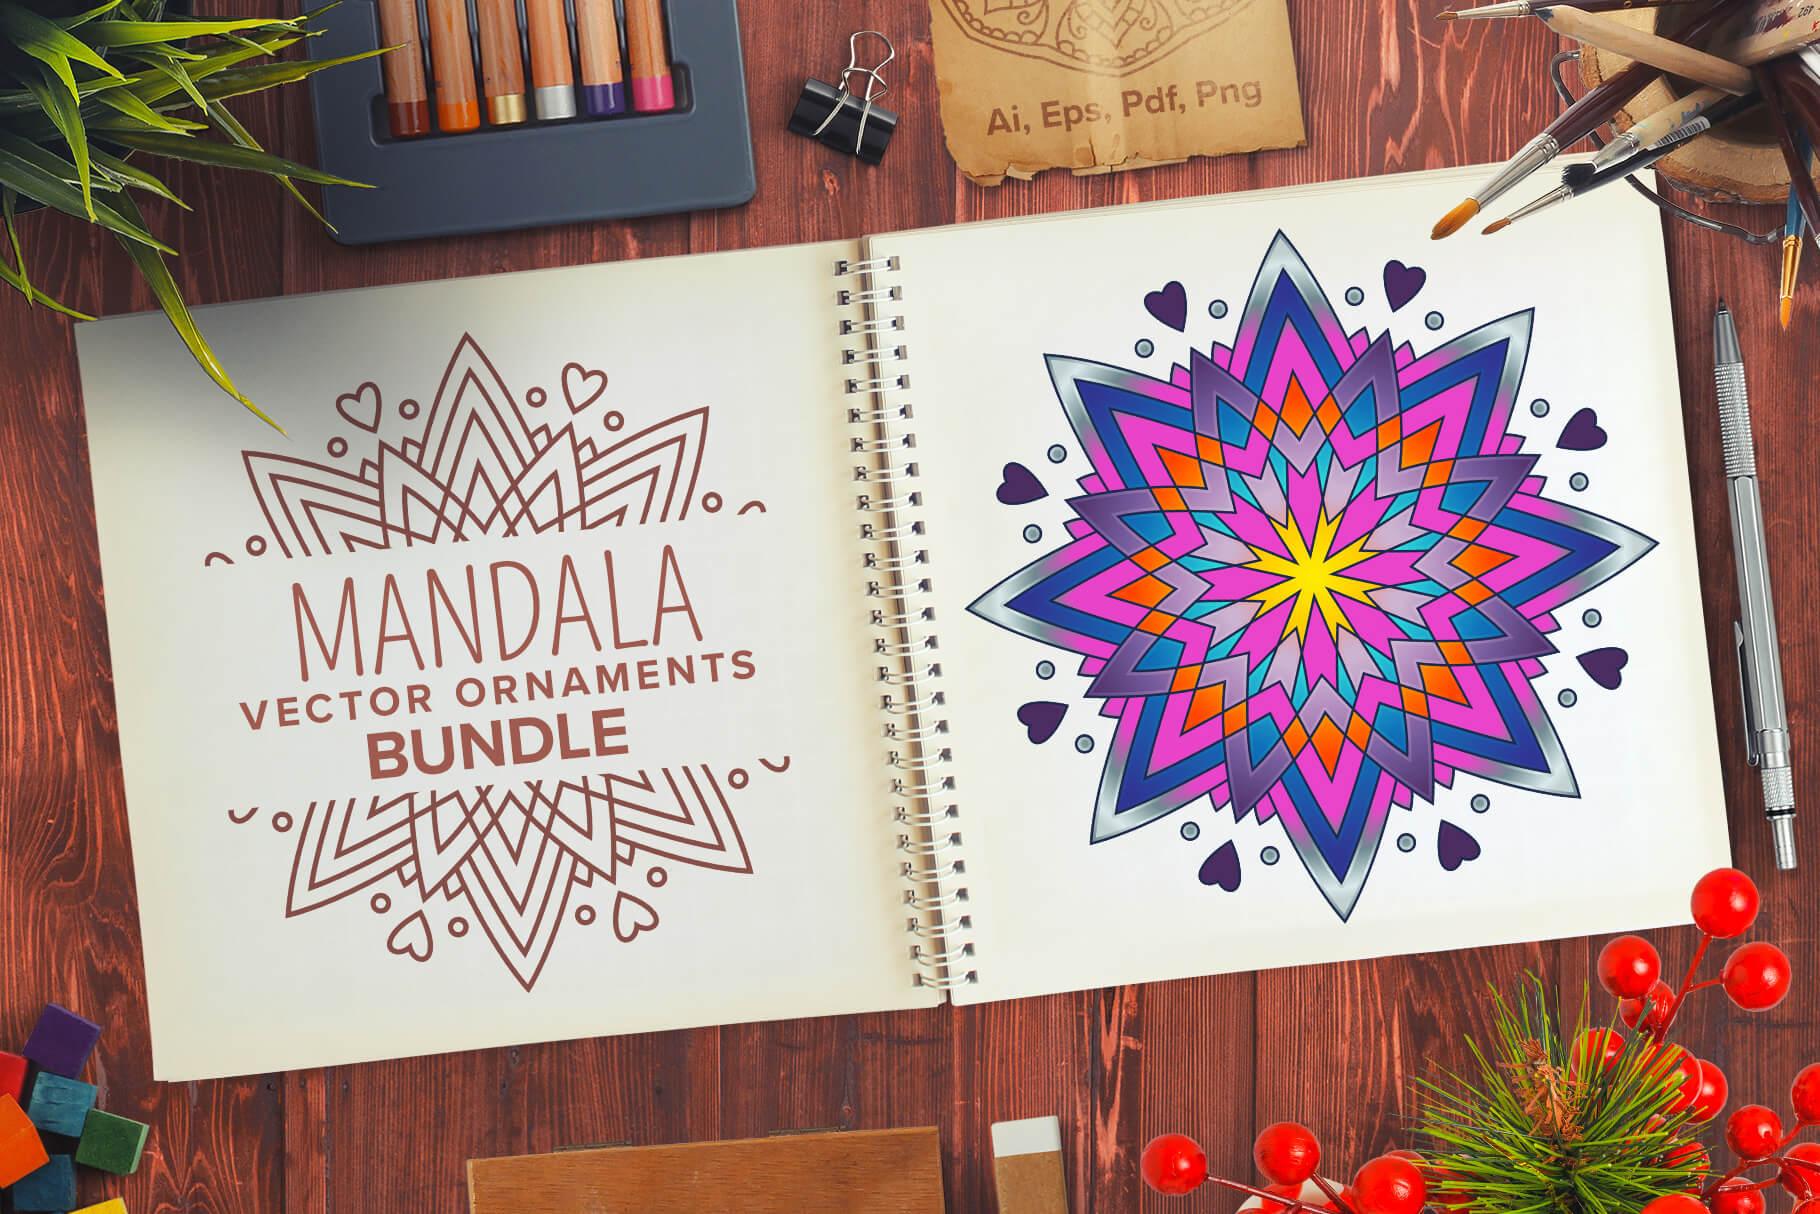 Bundle Of Mandala Ornaments - 01Mandala Vector Ornaments Bundle Preview